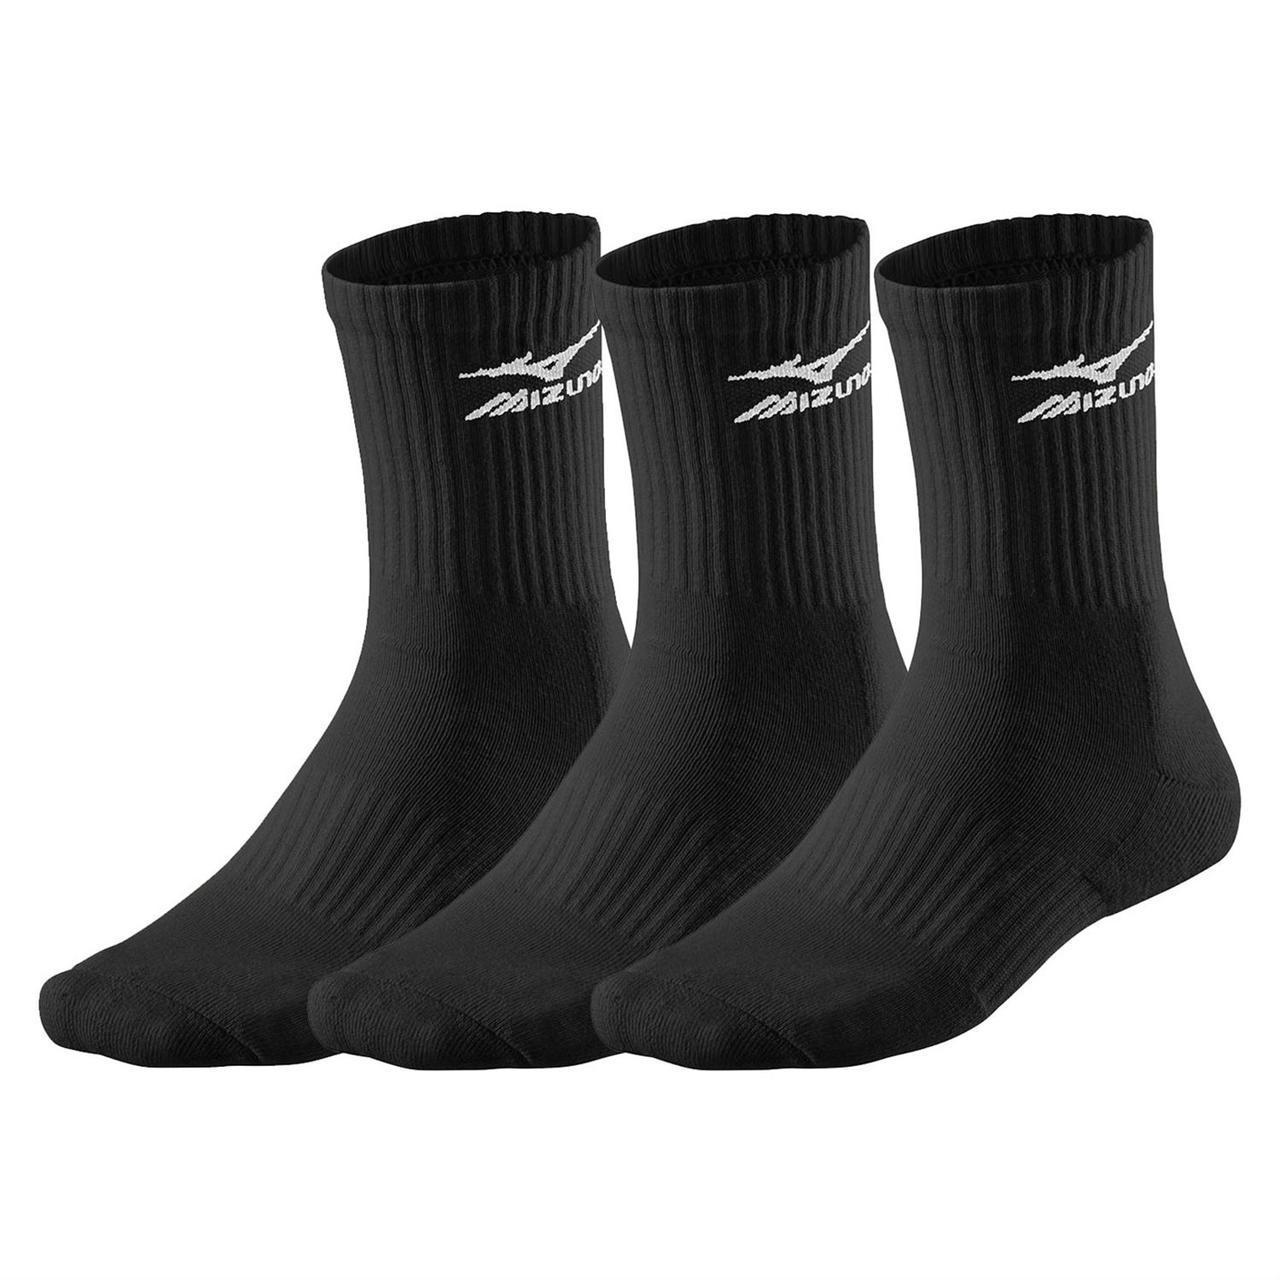 Носки Mizuno Training 3P Socks (32GX6A54-09)